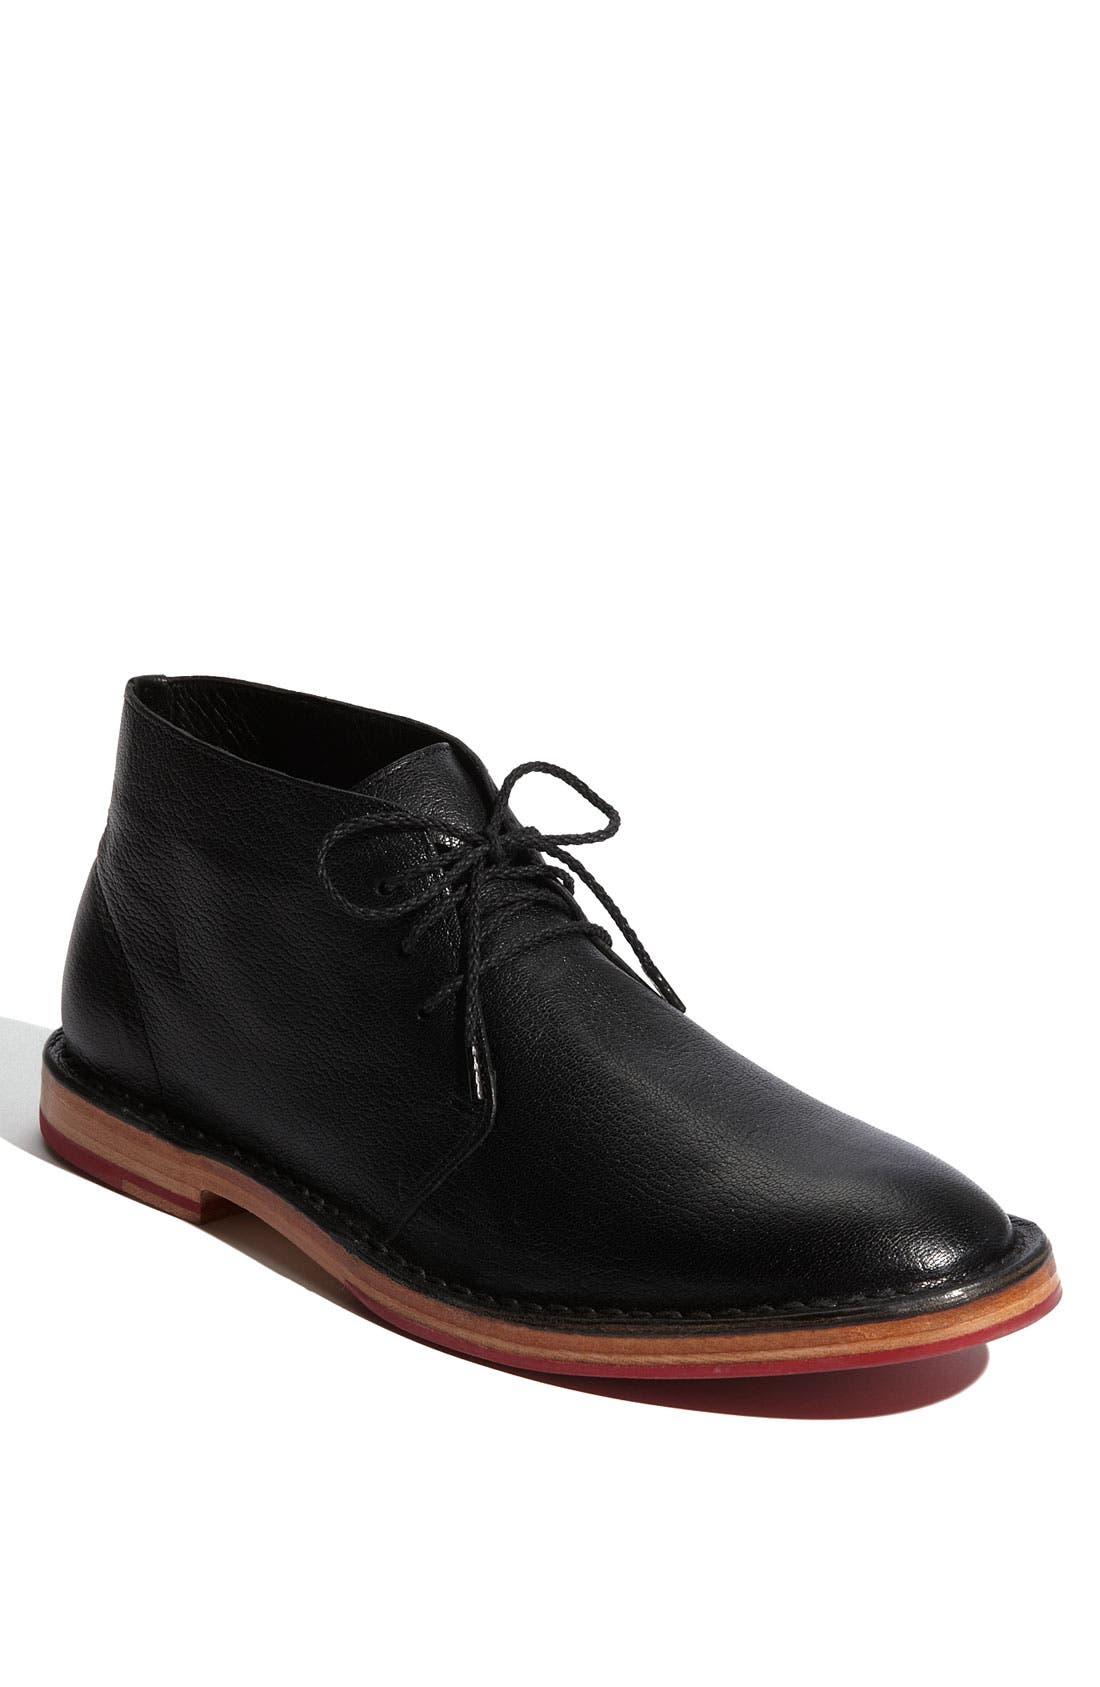 'Paul' Chukka Boot, Main, color, 001